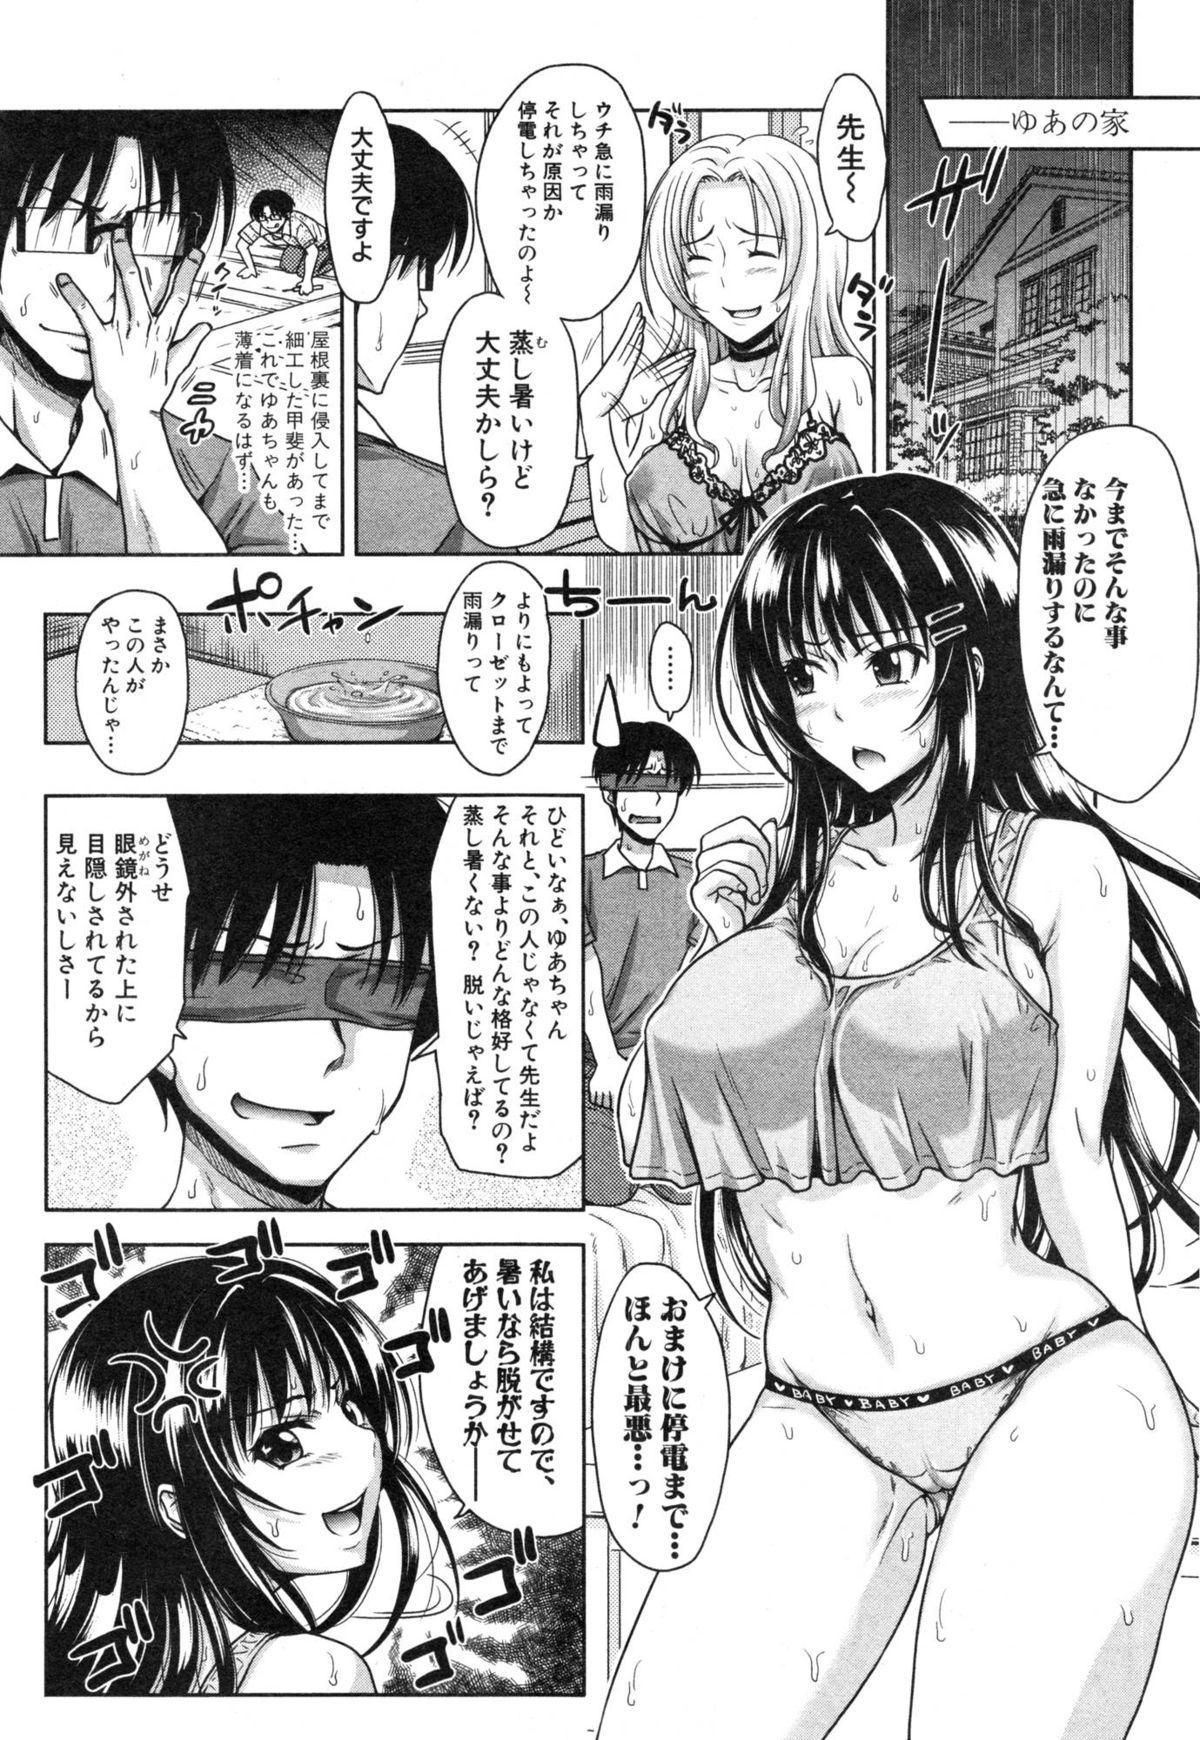 COMIC Shingeki 2015-01 204